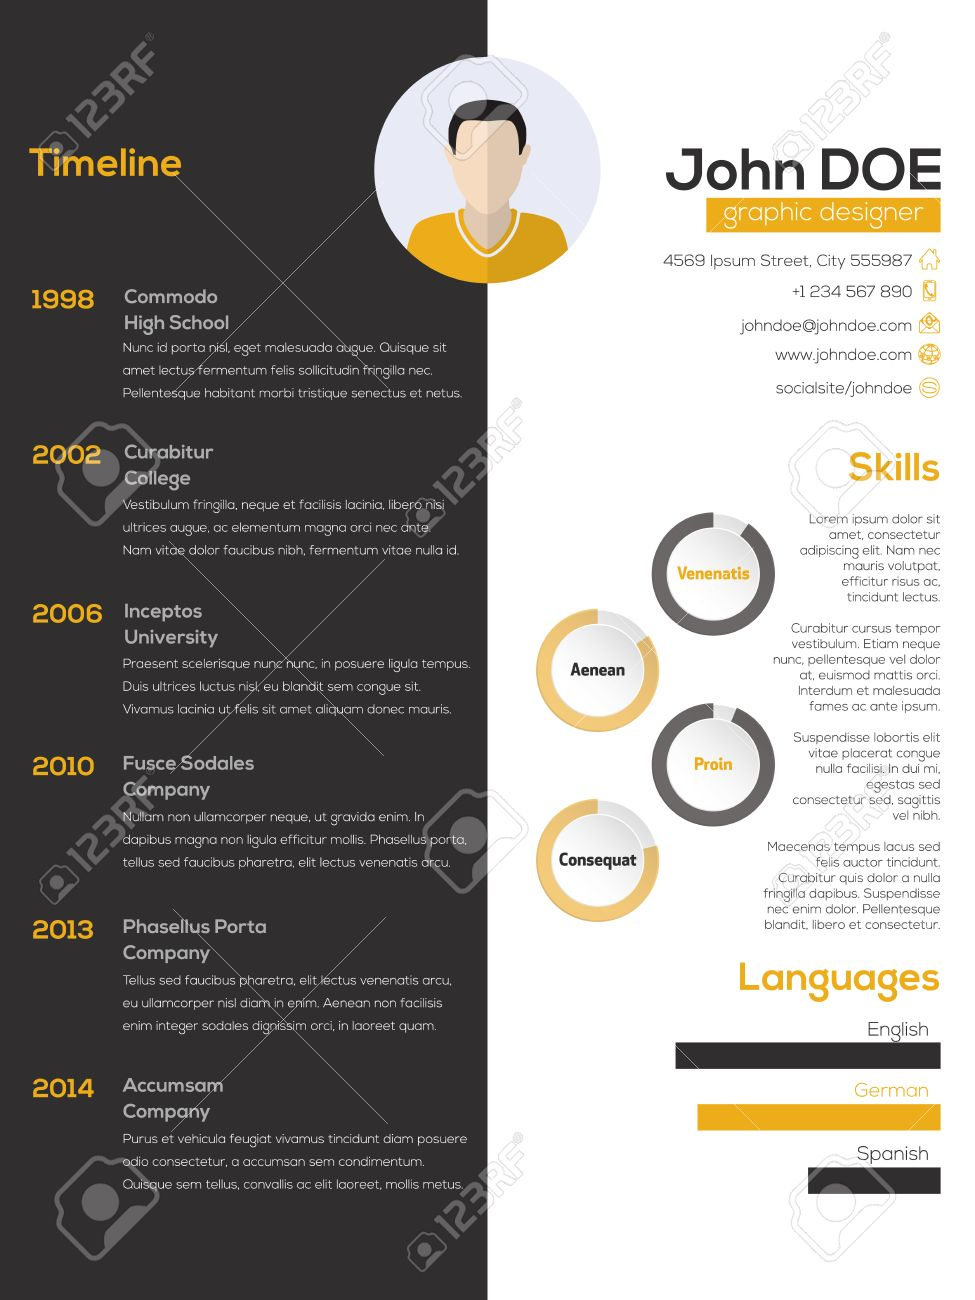 Curriculum Vitae Contraste Diseño Curricular Cv Vitae En Blanco ...